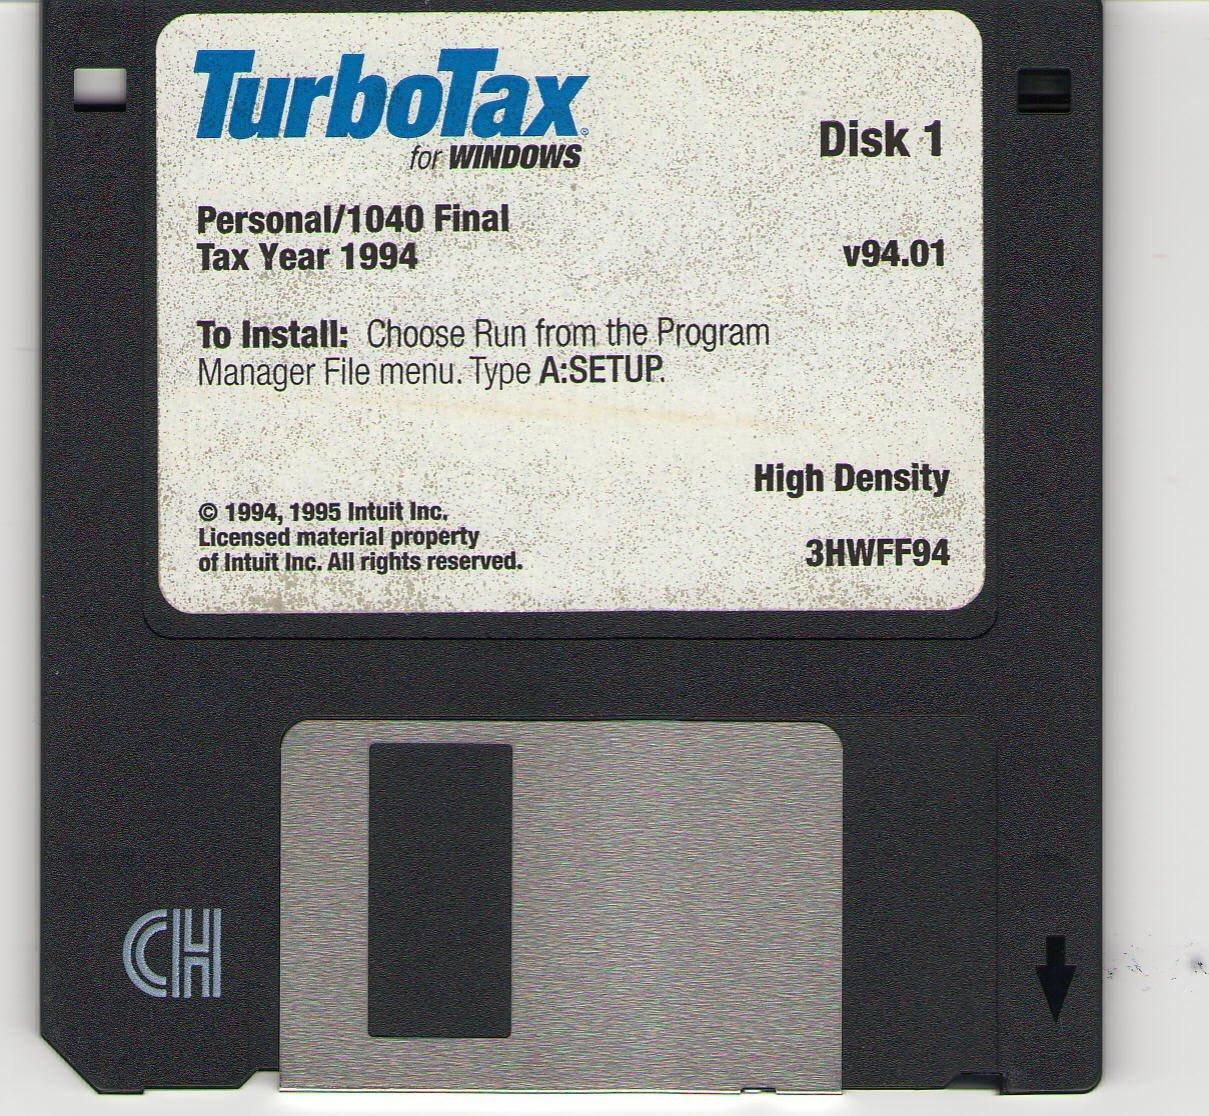 Turbotax for Windows 1994 (Personal) [CD-ROM] Windows 3.x